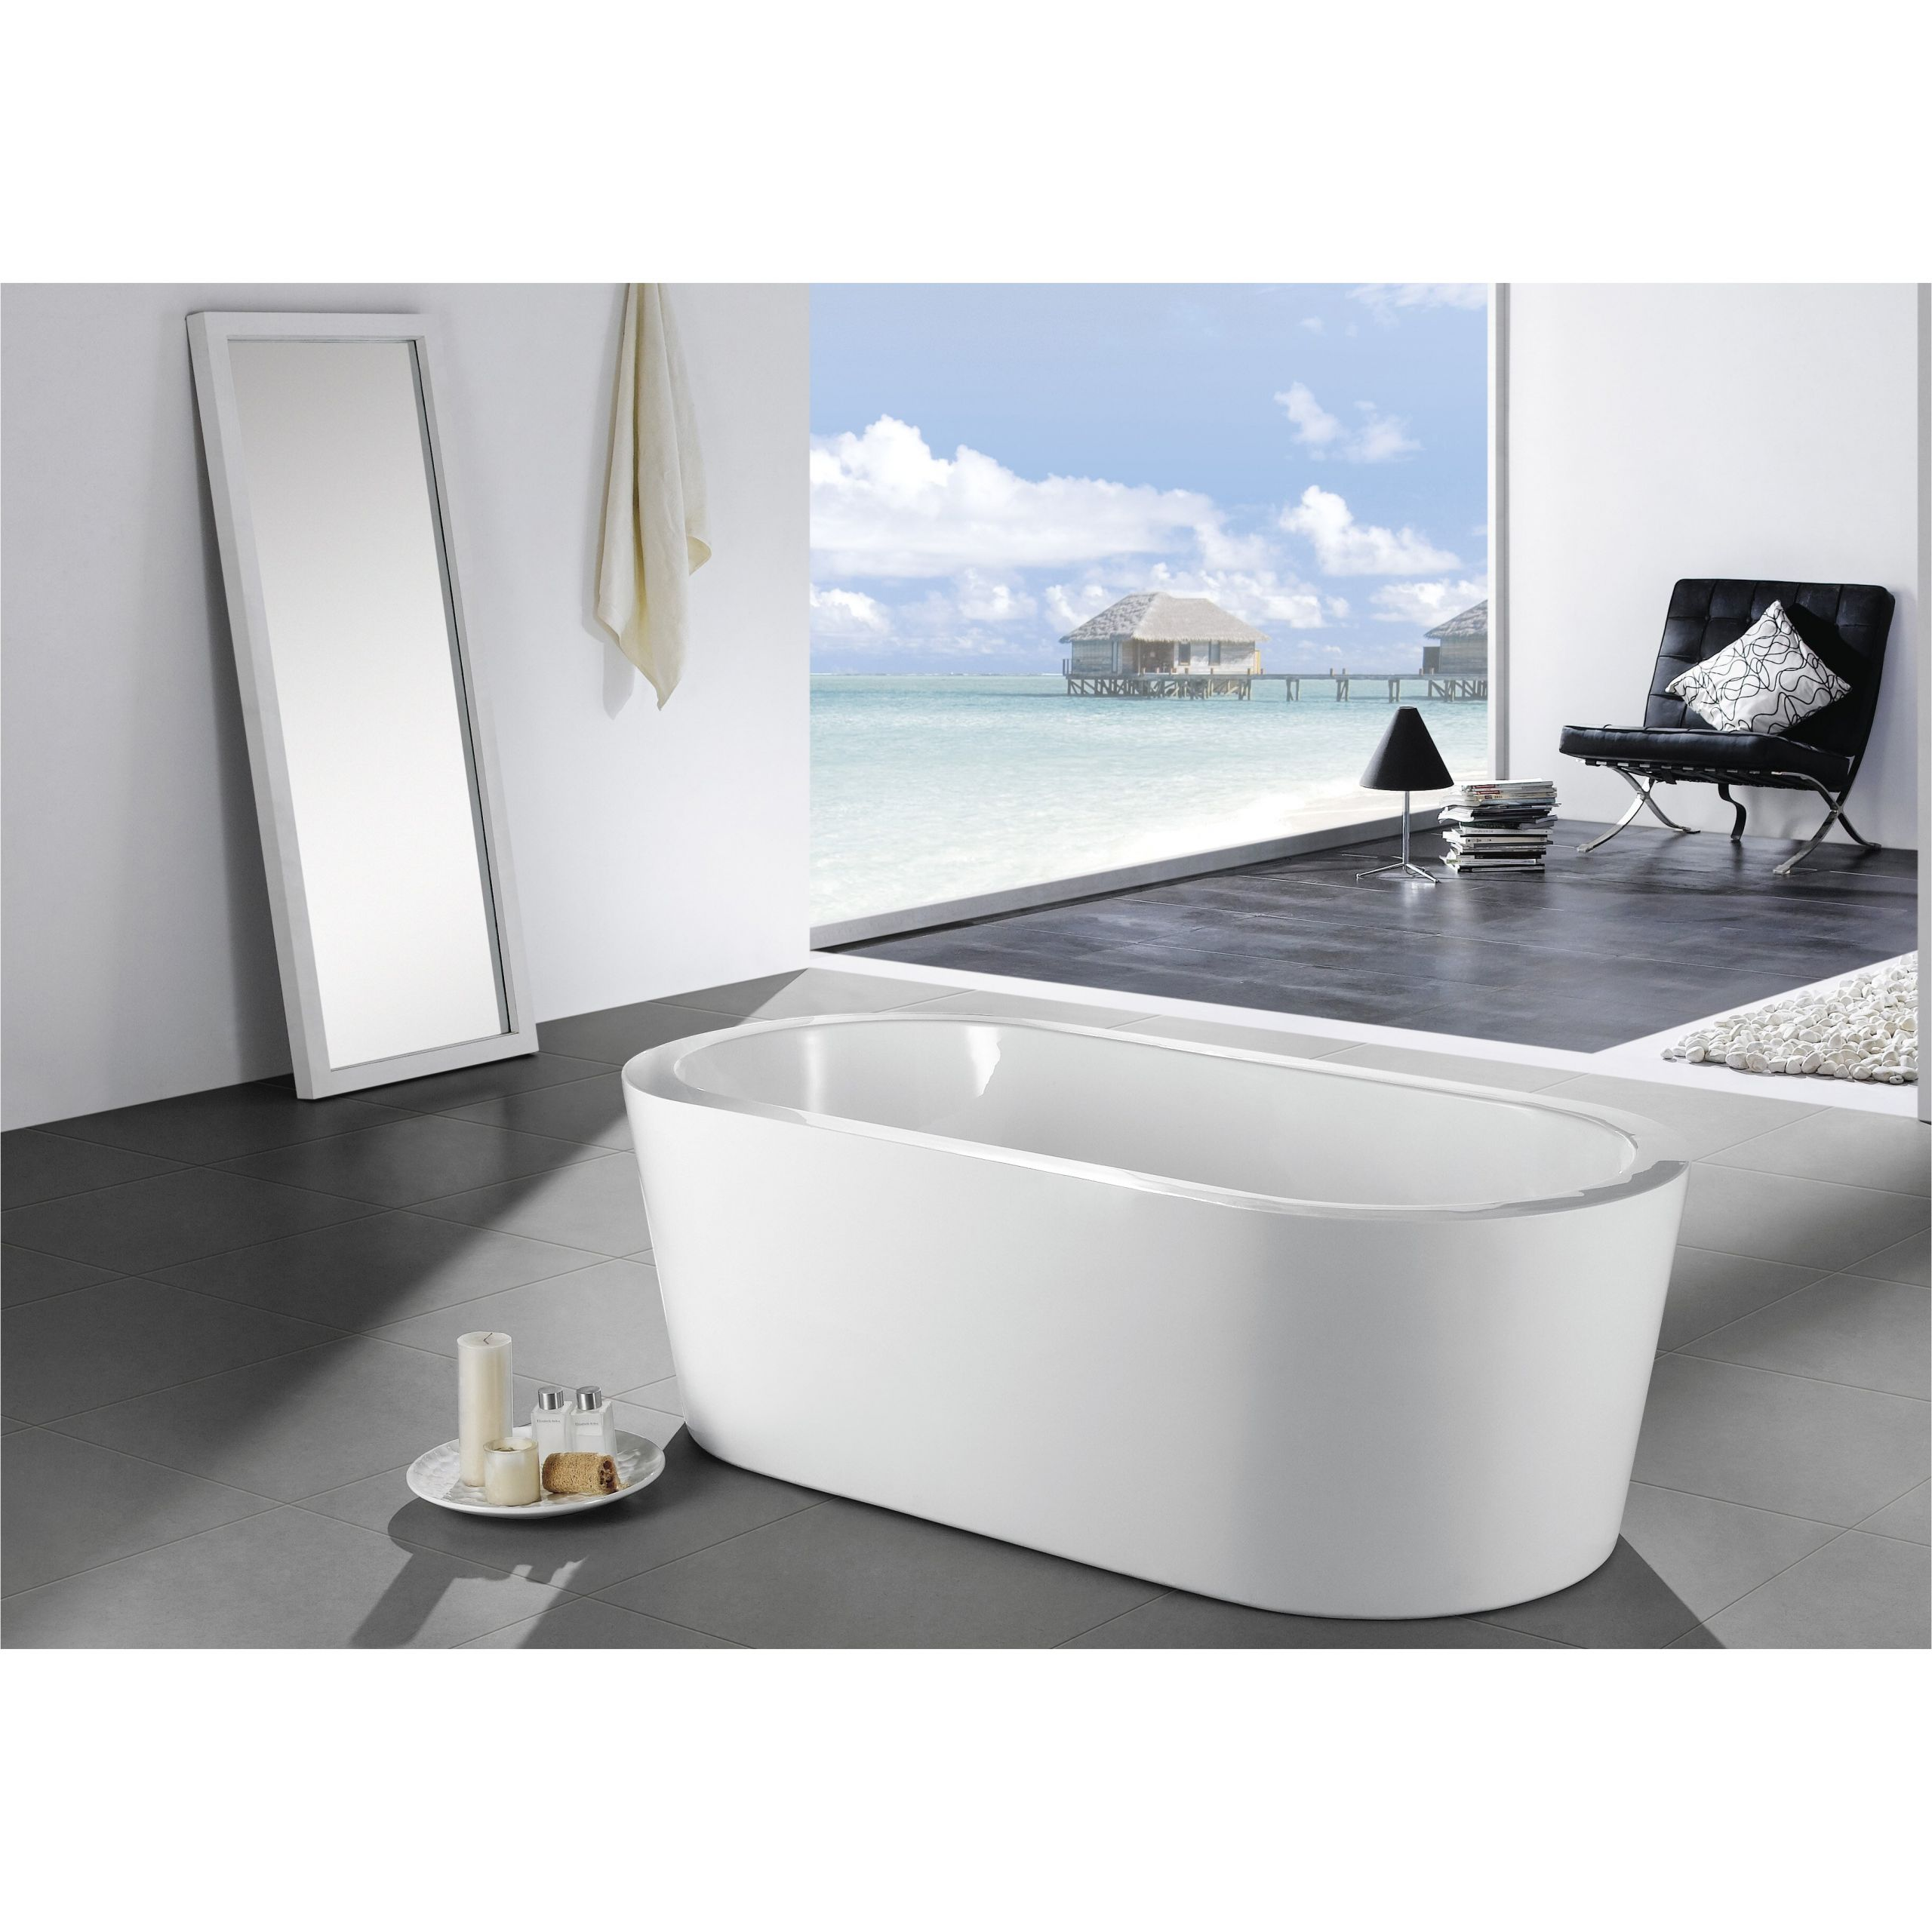 Eviva Ramo 58 x 29 Bathtub EVTB6201 59WH EVIE1203